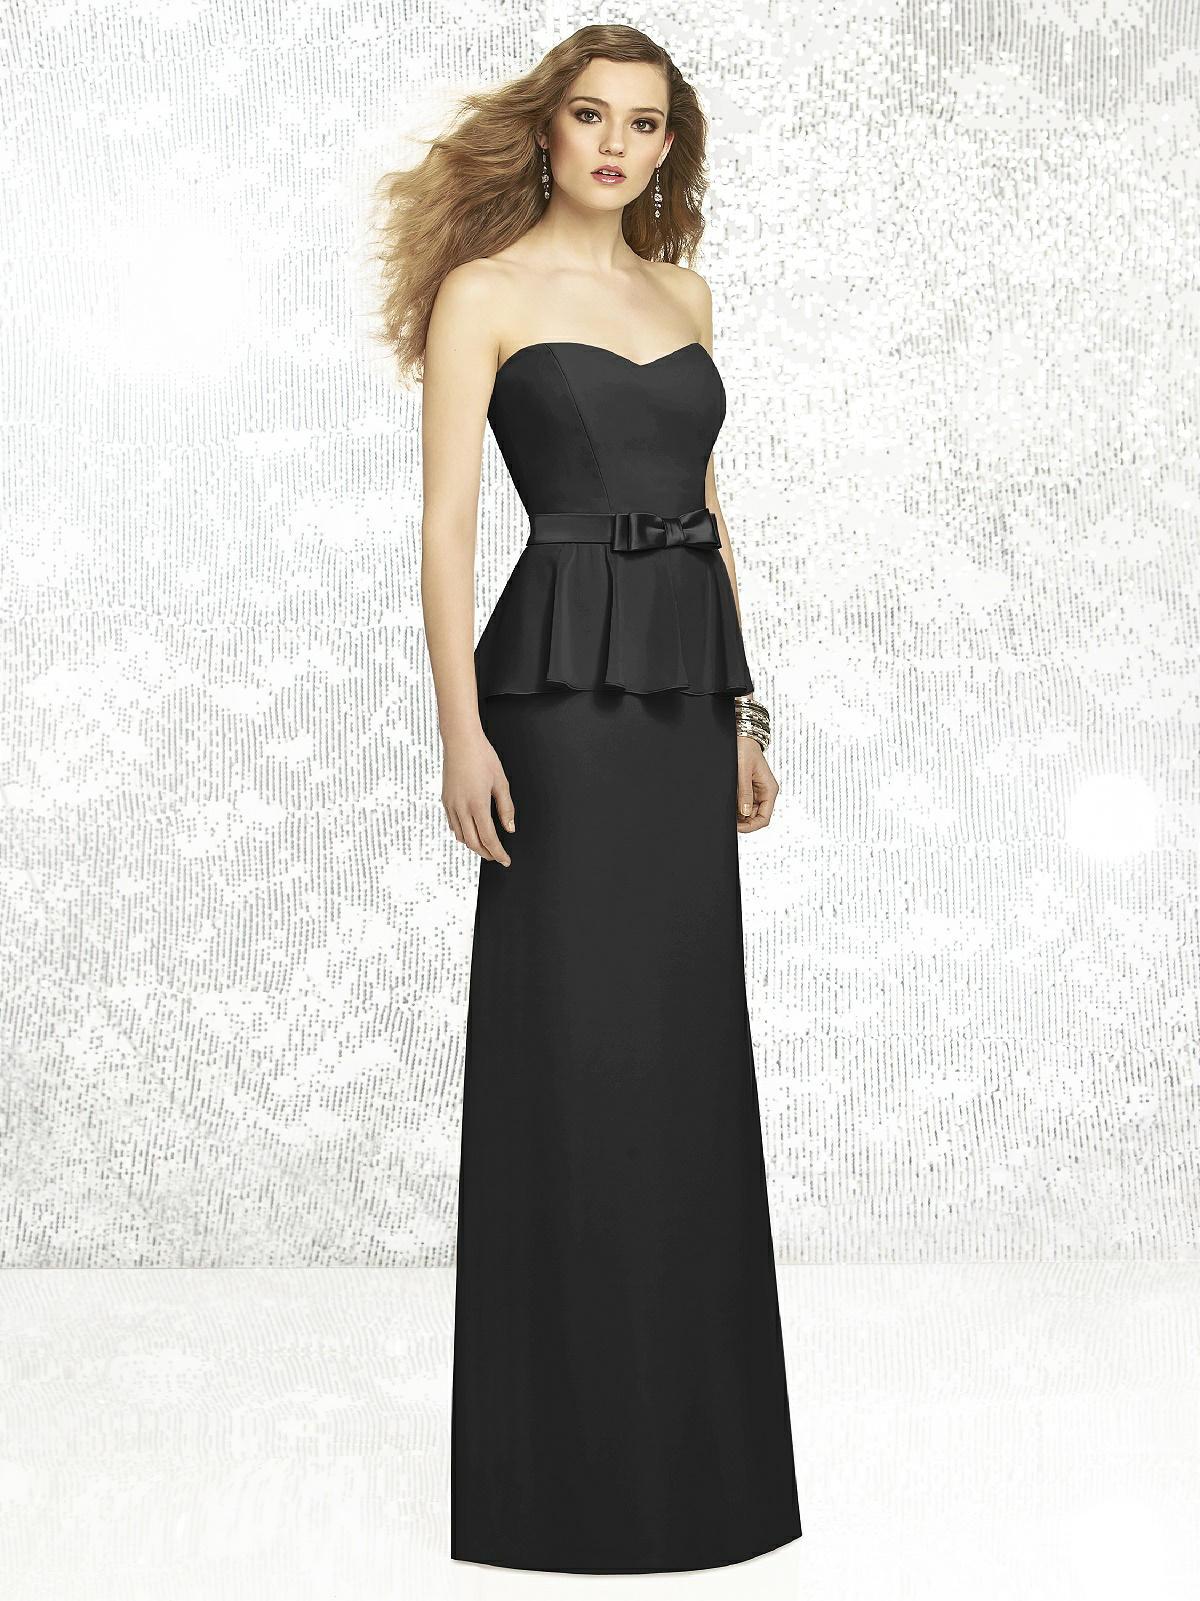 black bridesmaid dress with peplum